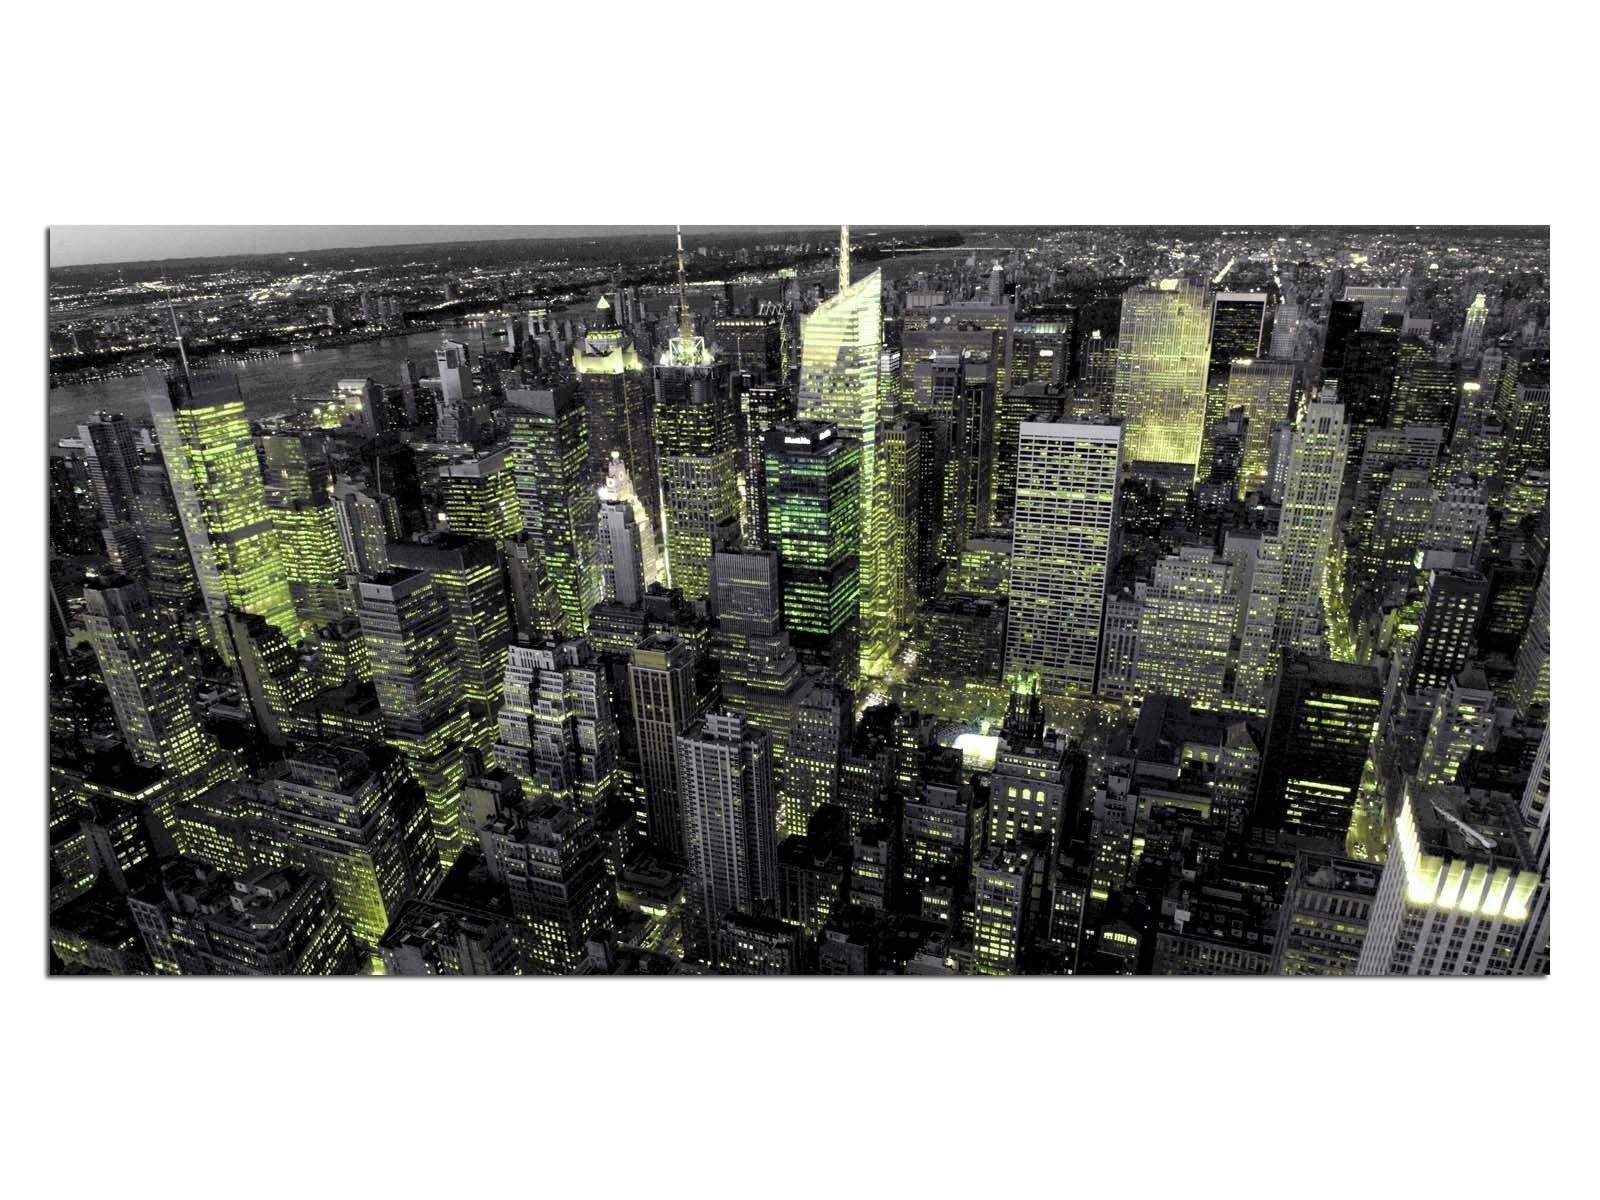 HD Glasbild EG4100500893 LICHTER NEW YORK GRÜN 100 x x x 50 cm Wandbild STADT c5ce0d